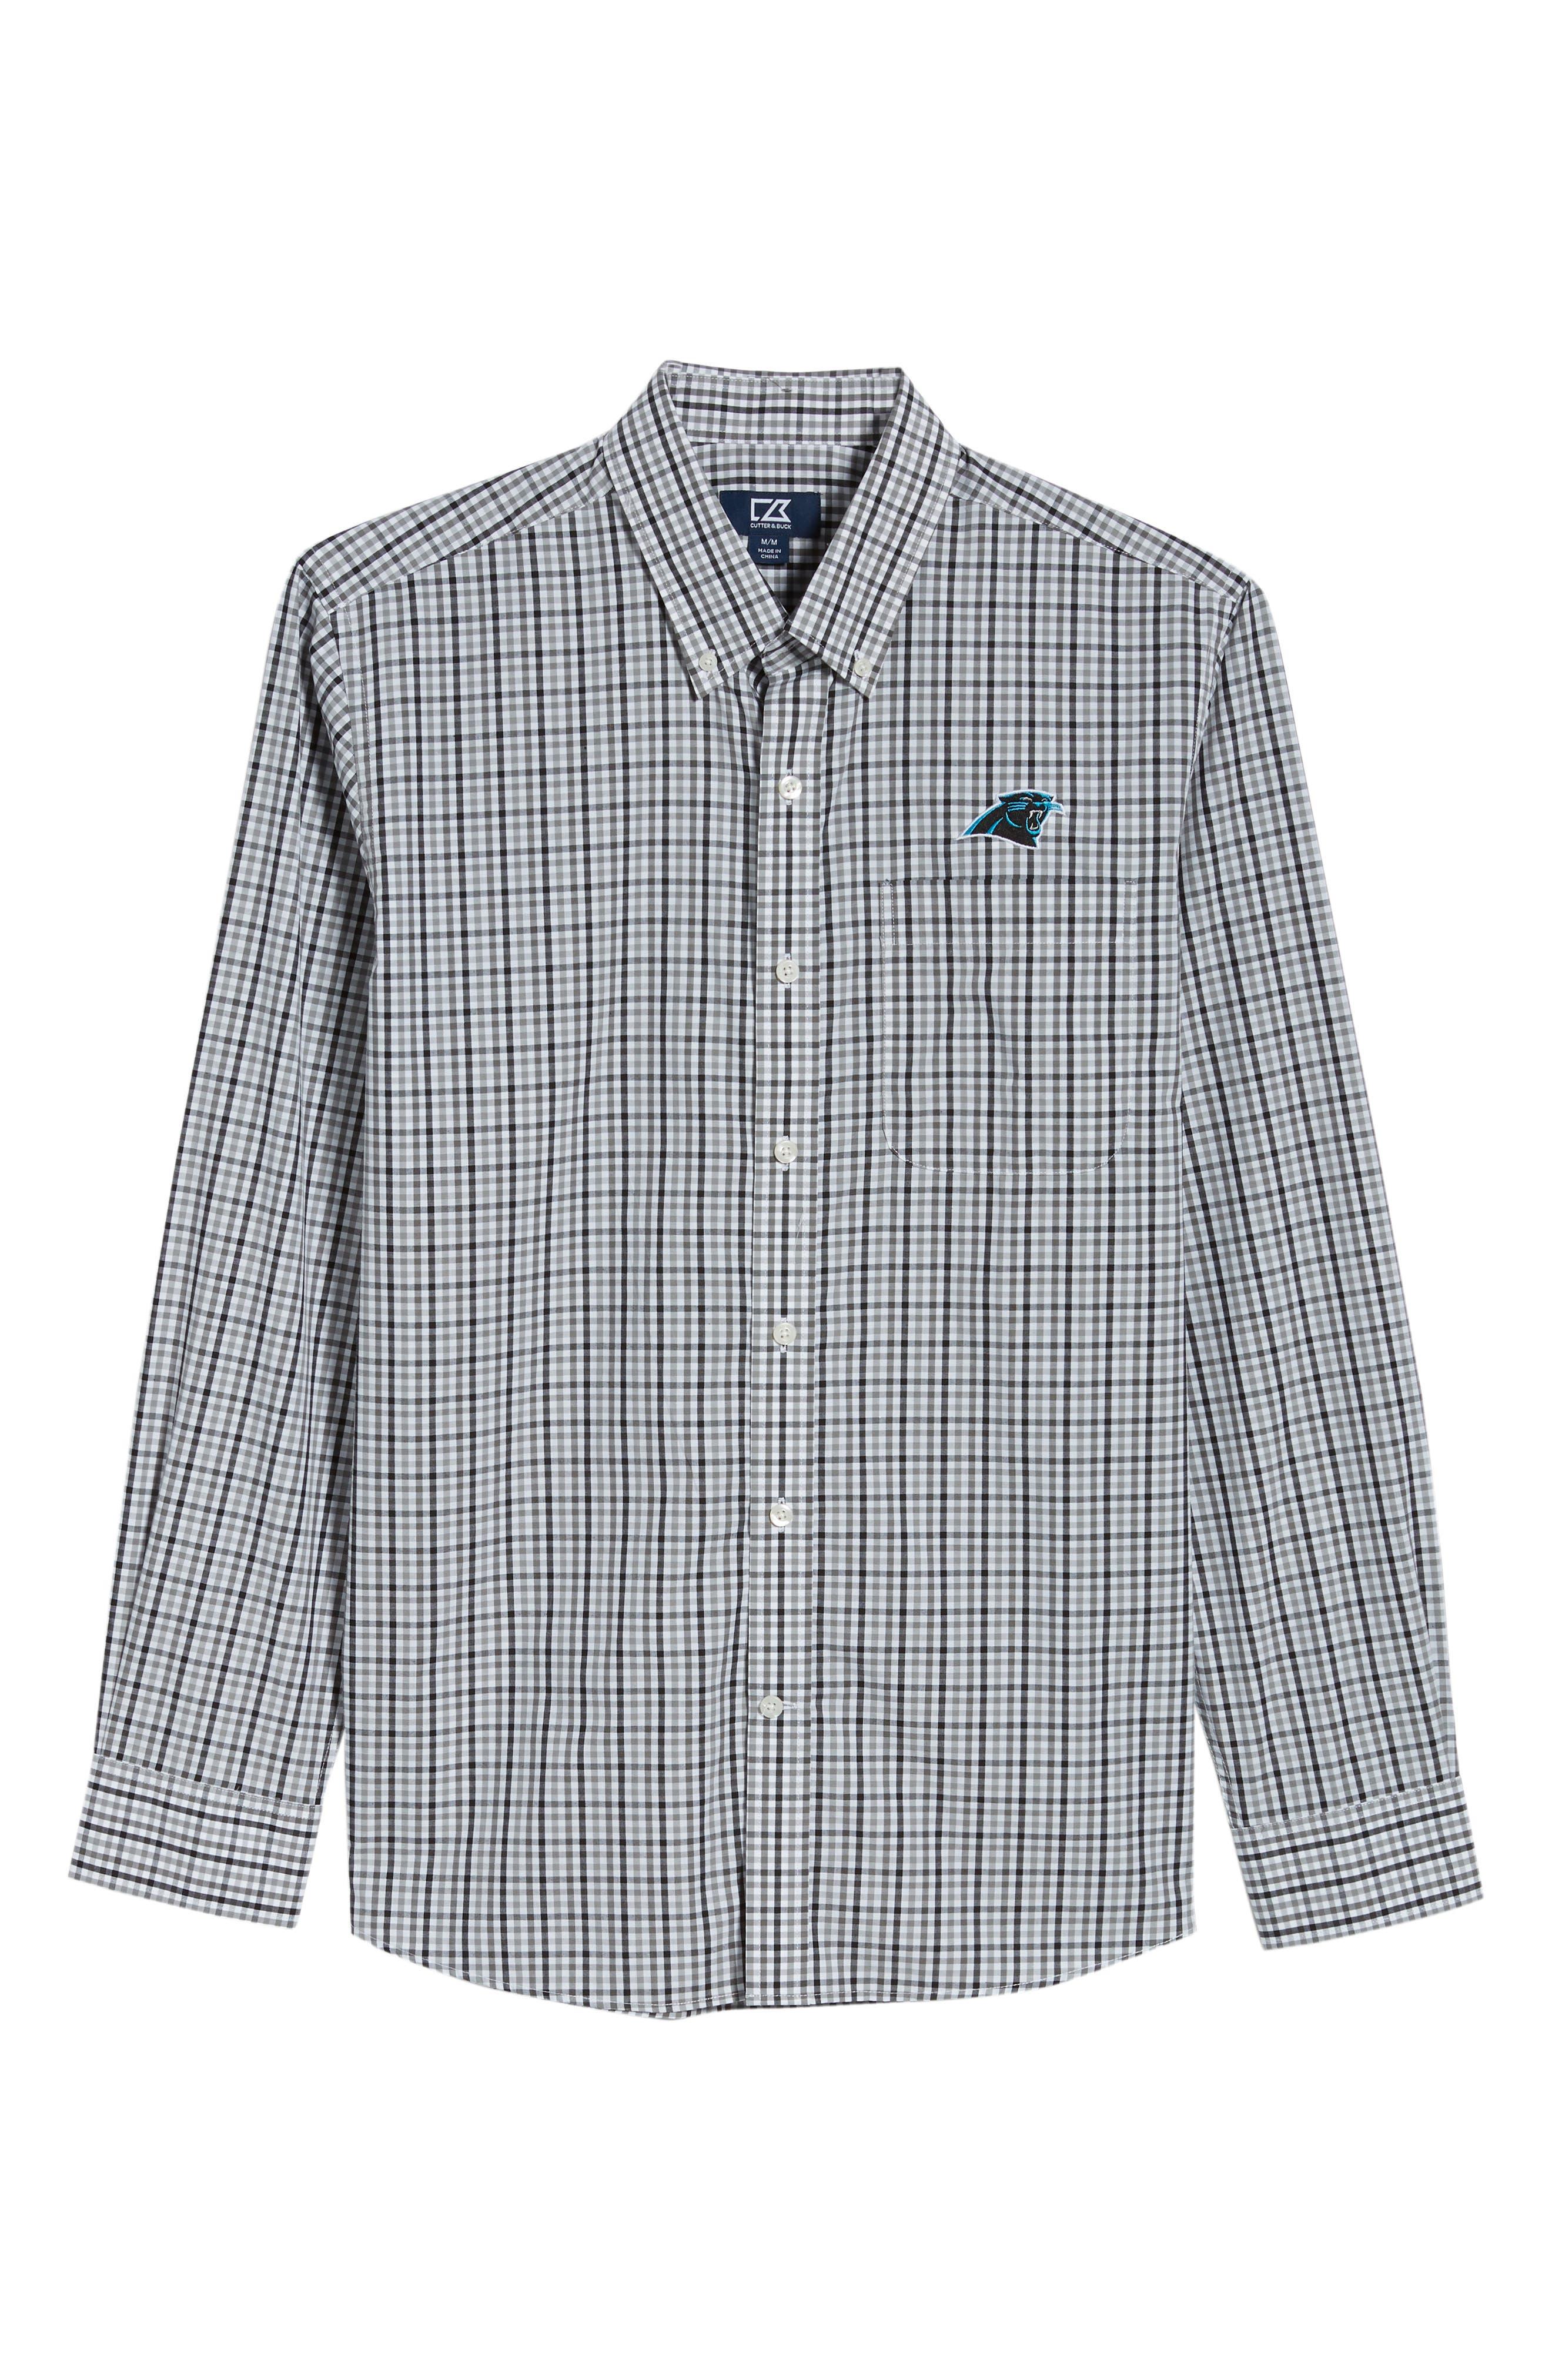 Carolina Panthers - Gilman Regular Fit Plaid Sport Shirt,                             Alternate thumbnail 6, color,                             BLACK